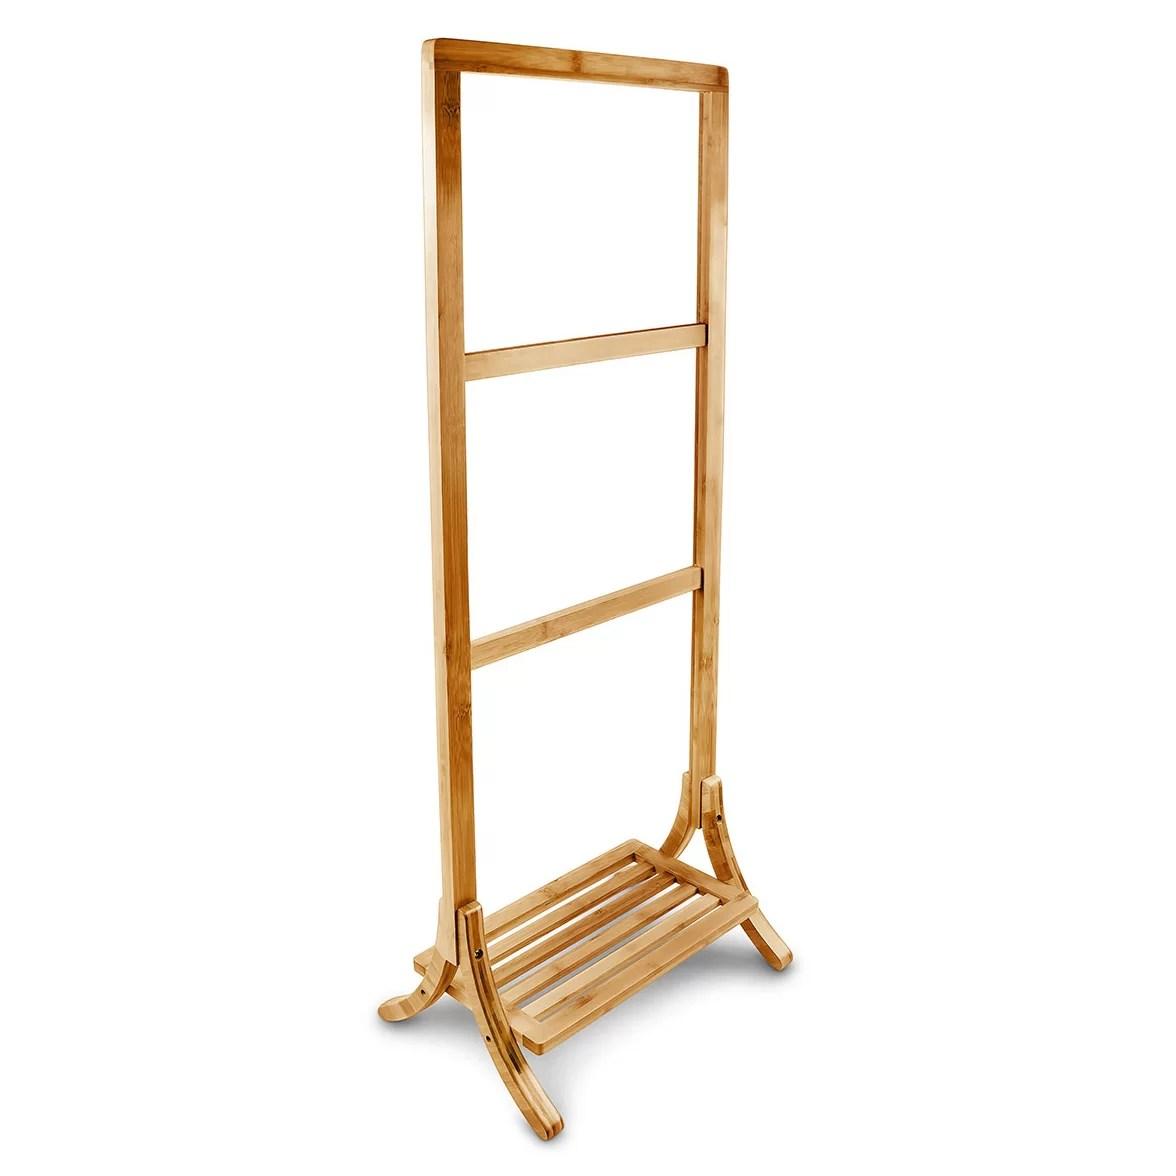 Belfry Bamboo Free Standing Towel Rack Wayfair UK